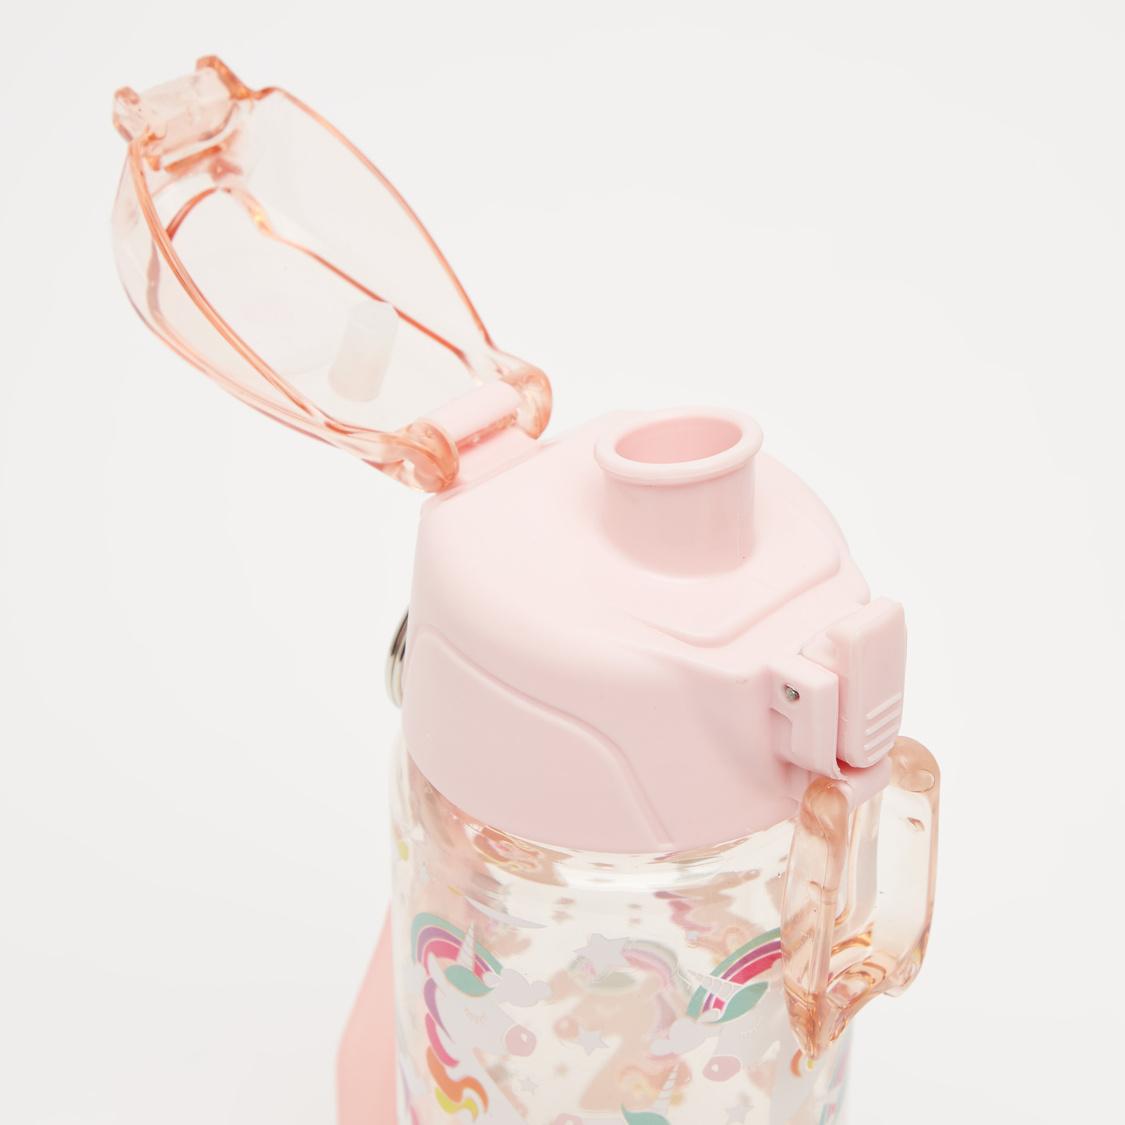 قارورة مياه بطبعات يونيكورن وصنبور وسوار - 550 مل